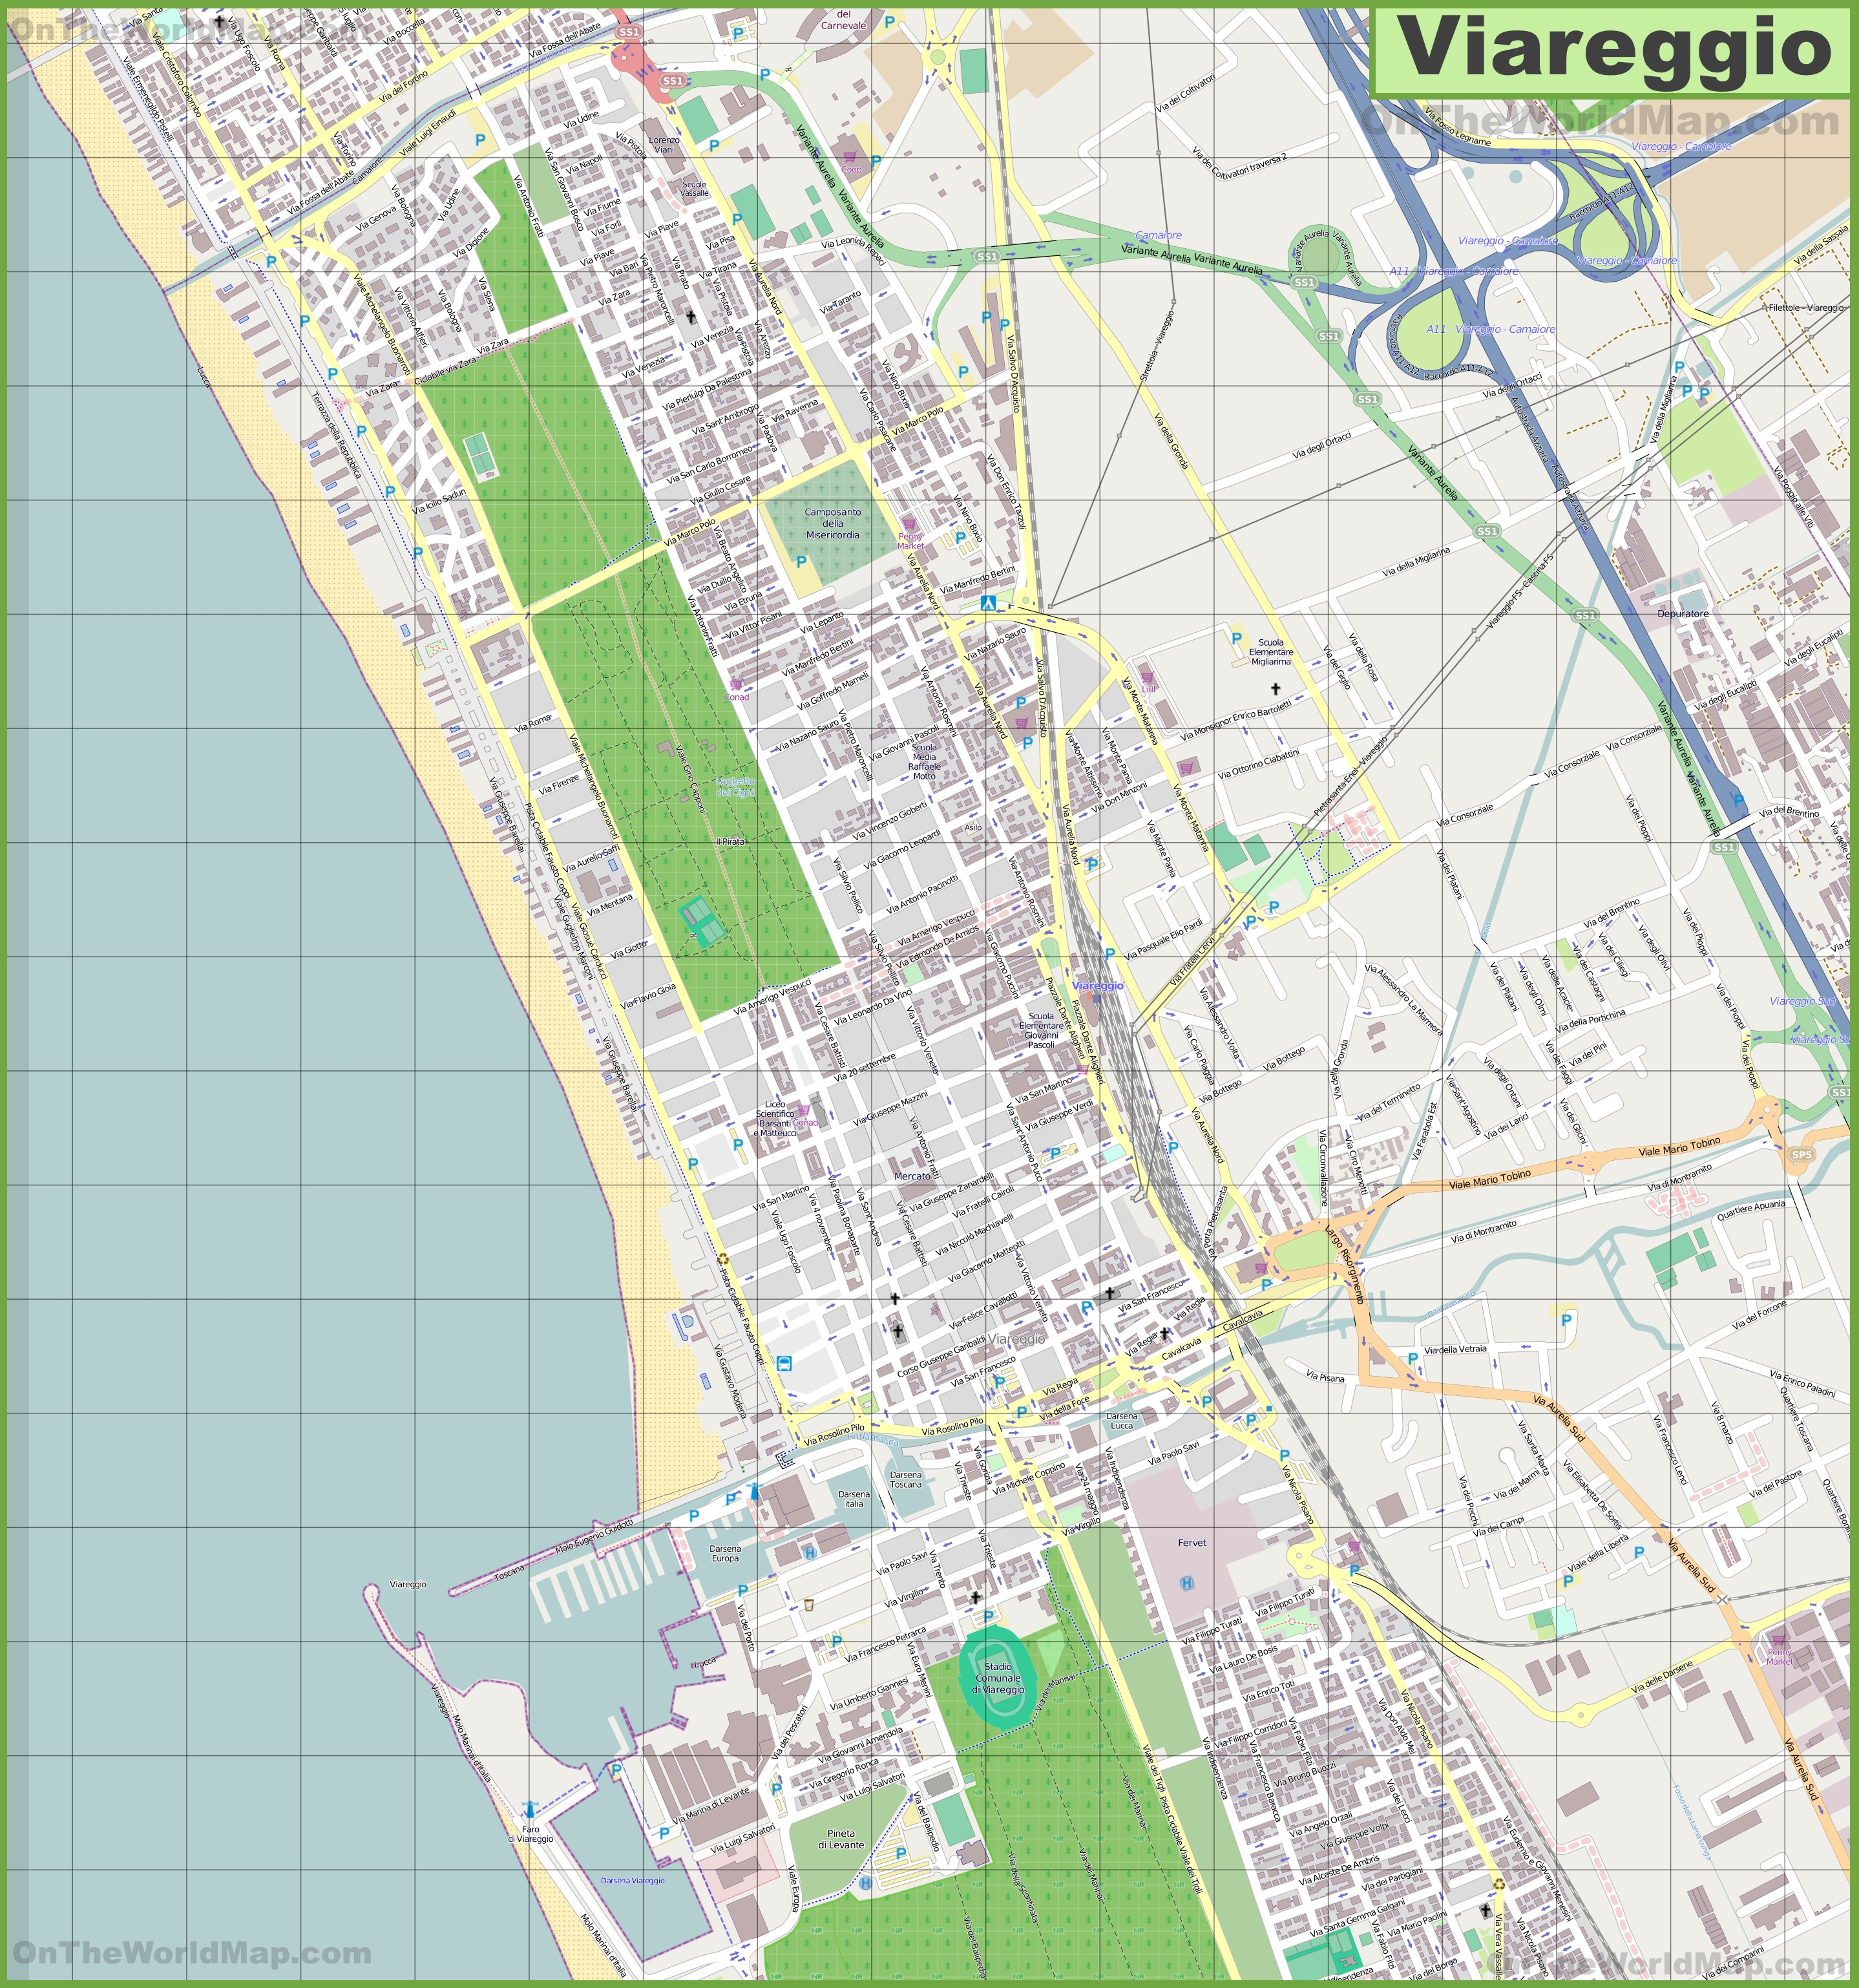 Viareggio Maps Italy Maps of Viareggio